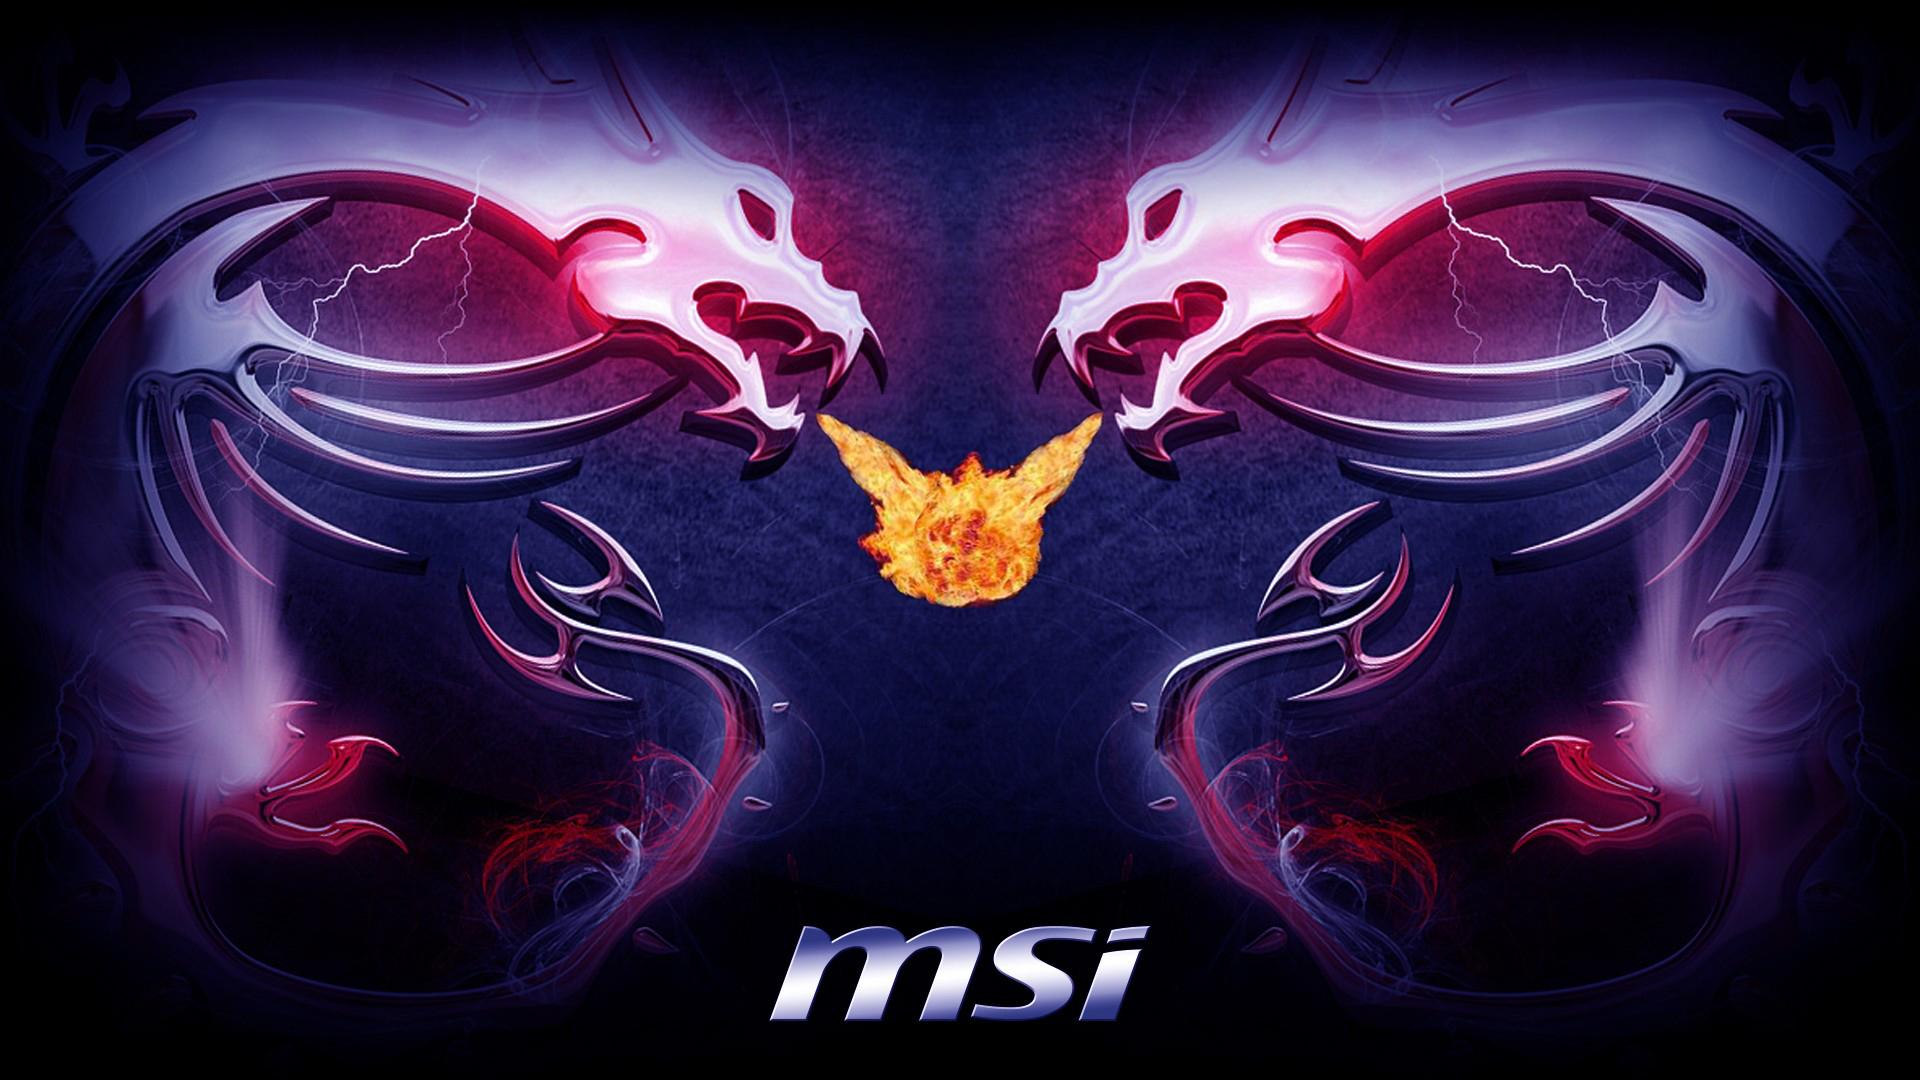 msi twin dragon logo fire flame breath hd 1920x1080 1080p wallpaper 1920x1080